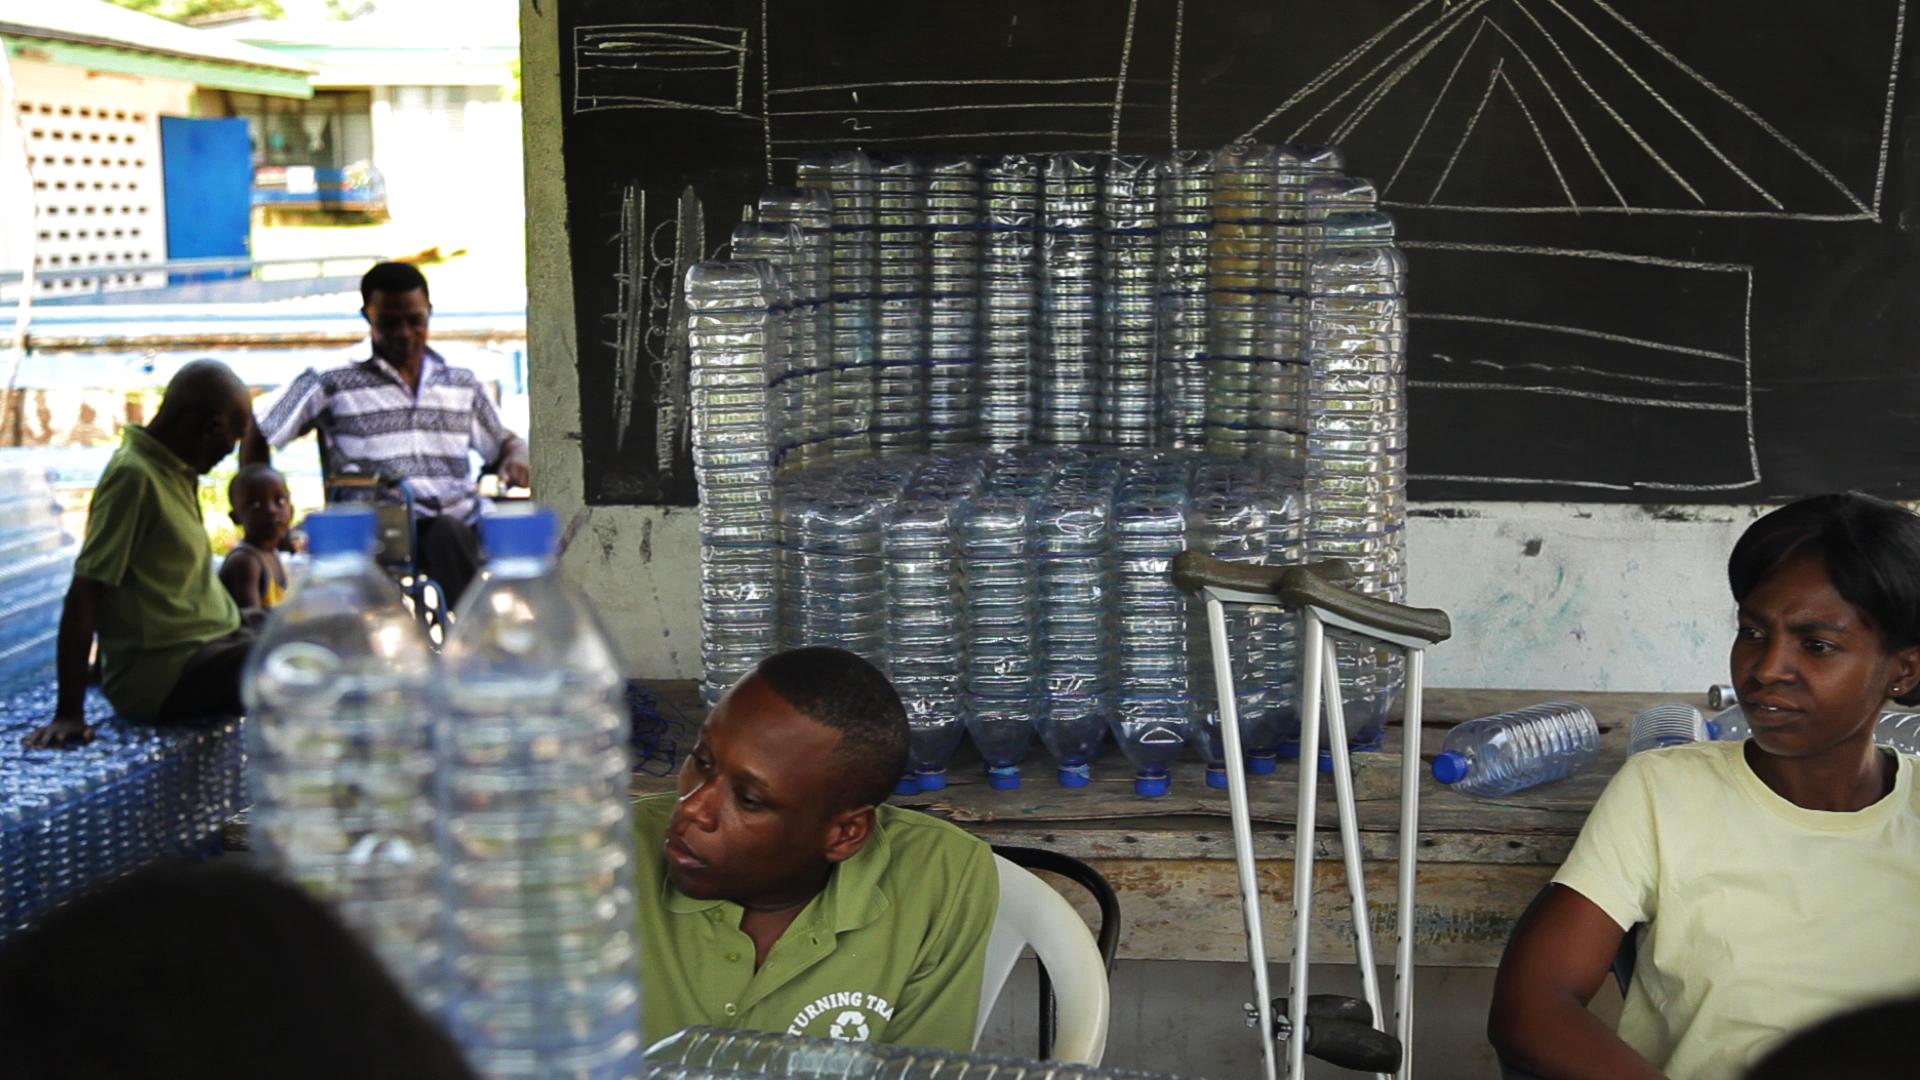 Fabricación de Mobiliario en base a residuos plásticos en Ghana. Image © ONU